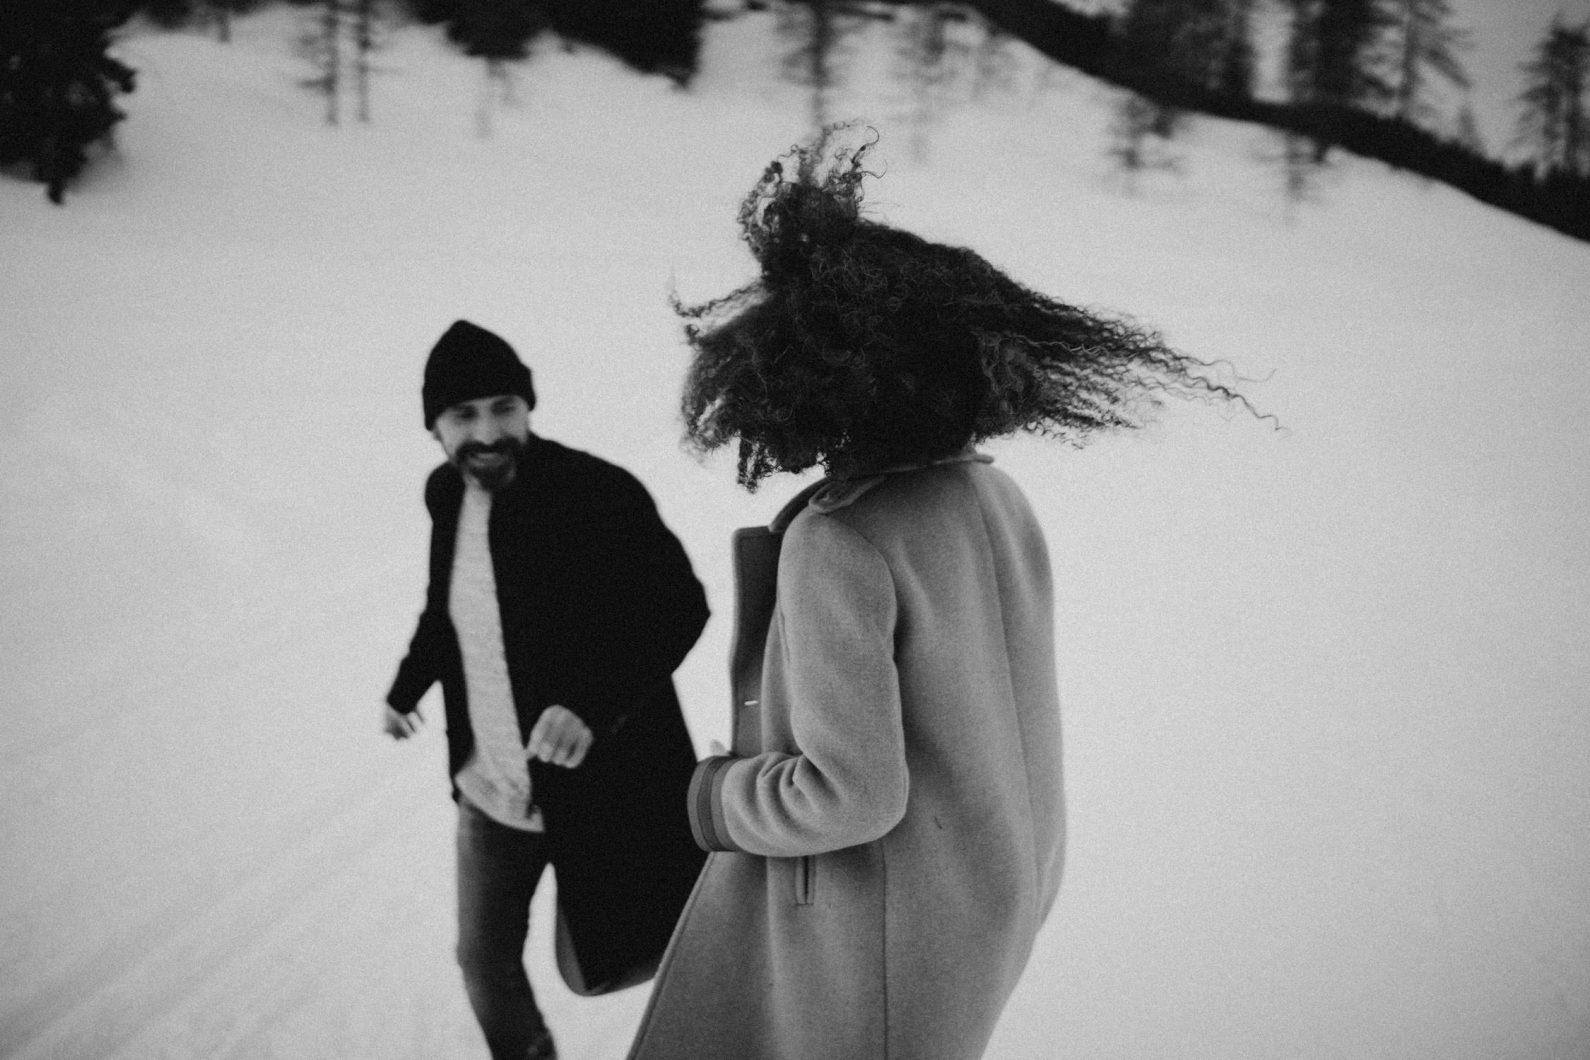 dan-jenson-photography-13